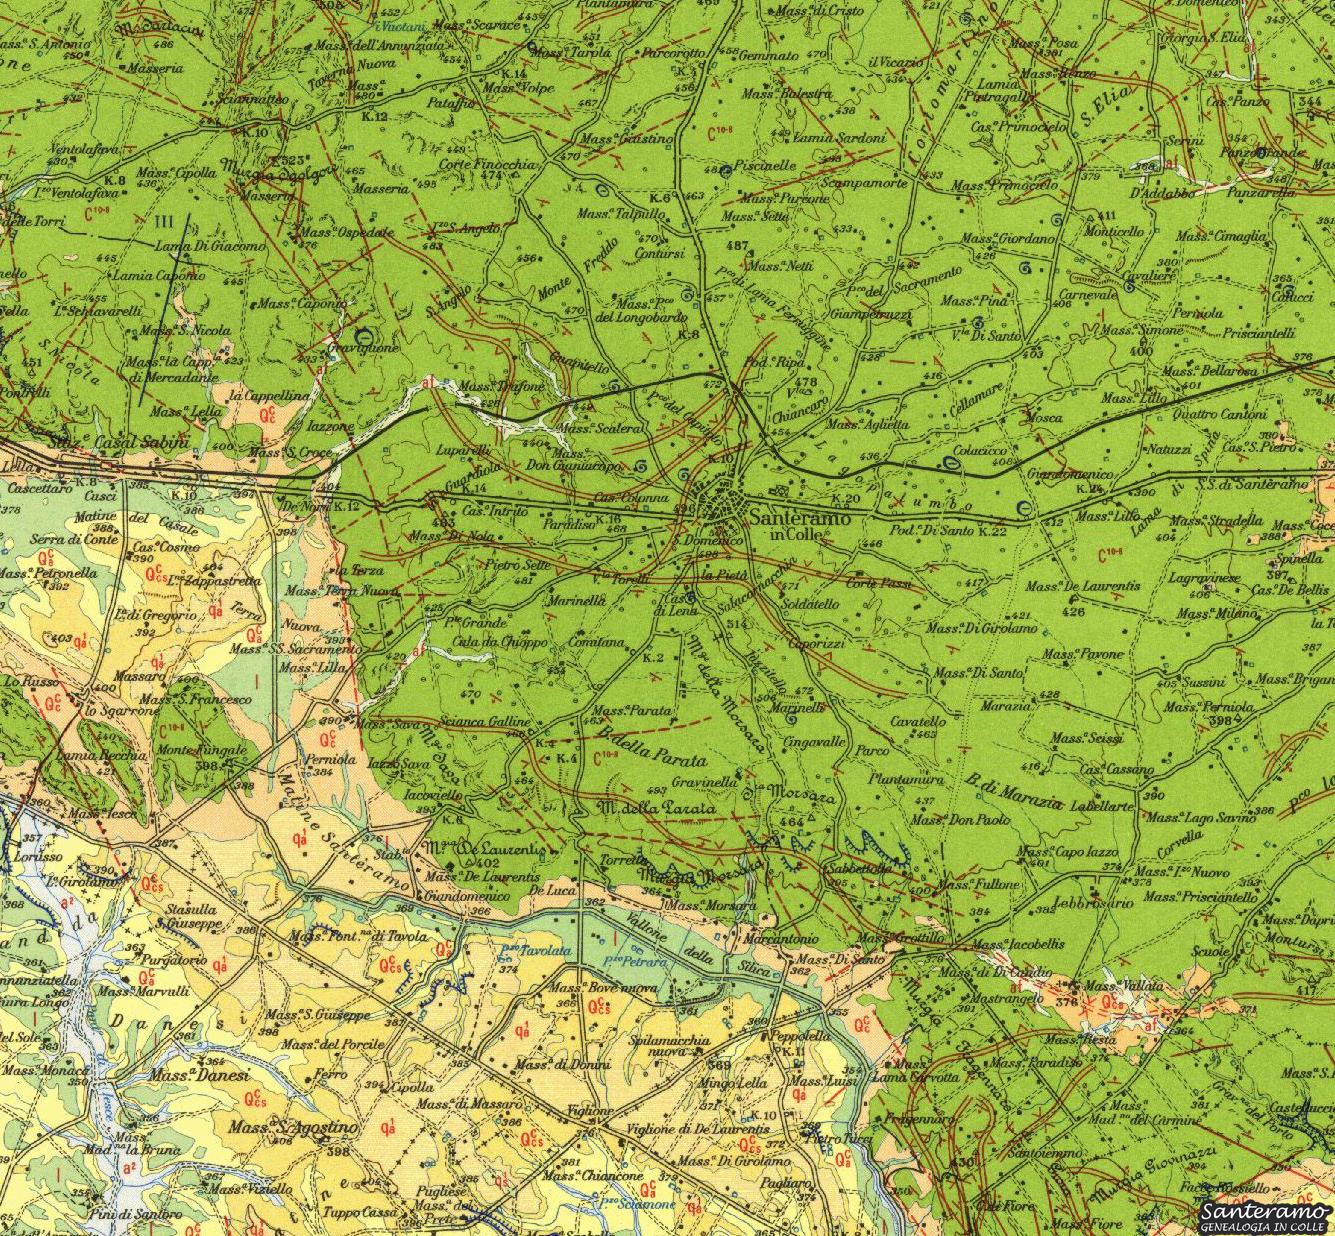 La Carta Geologica dell'ISPRA